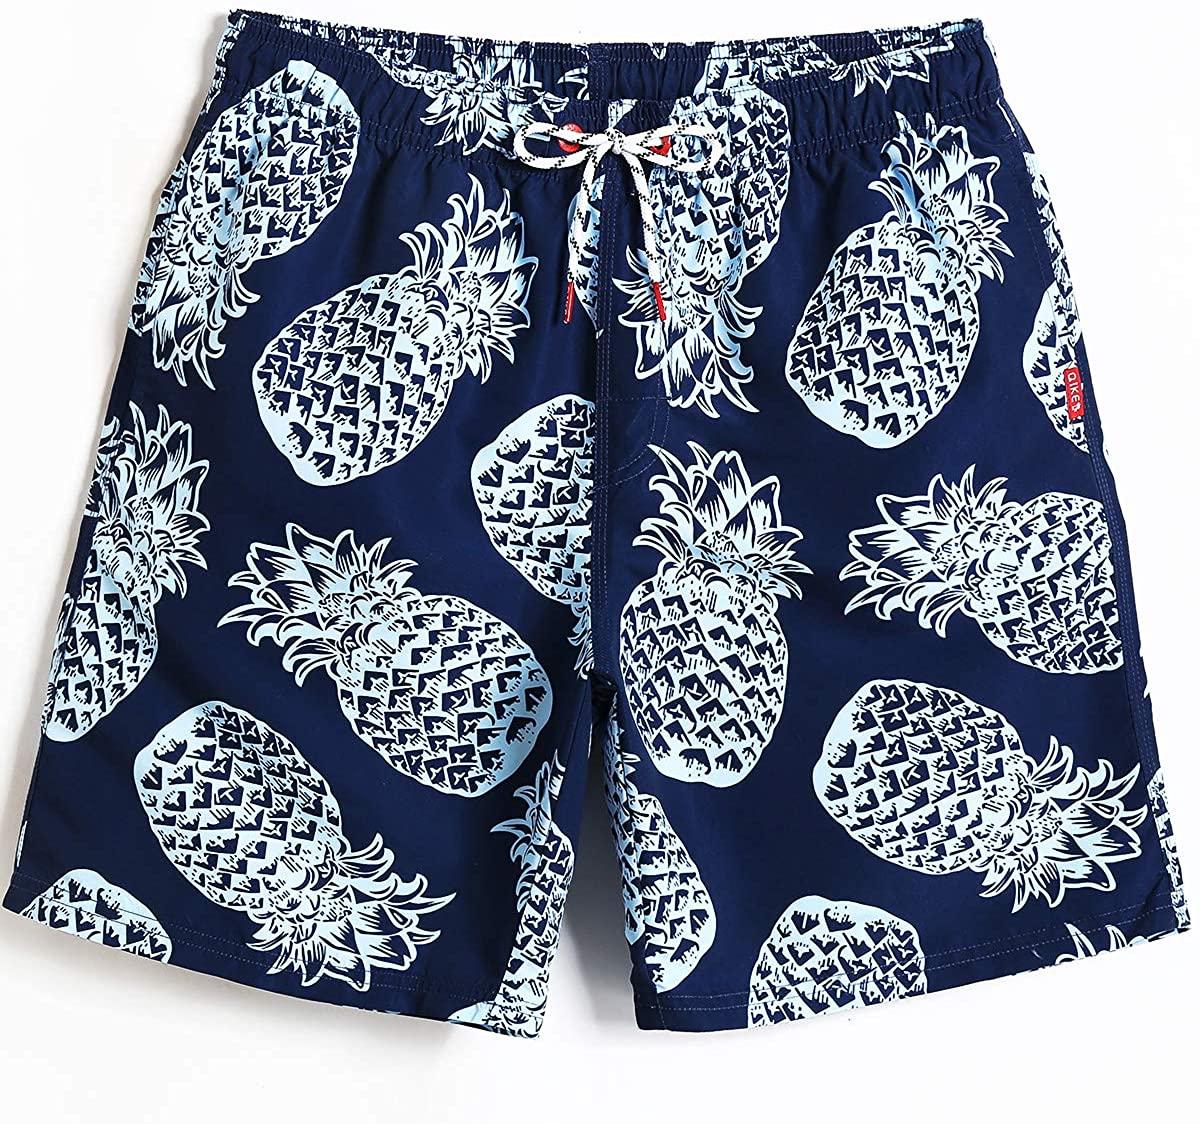 Beamlet Mens Swim Trunks Quick Dry Beachwear Board Shorts Swimwear with Mesh Lining